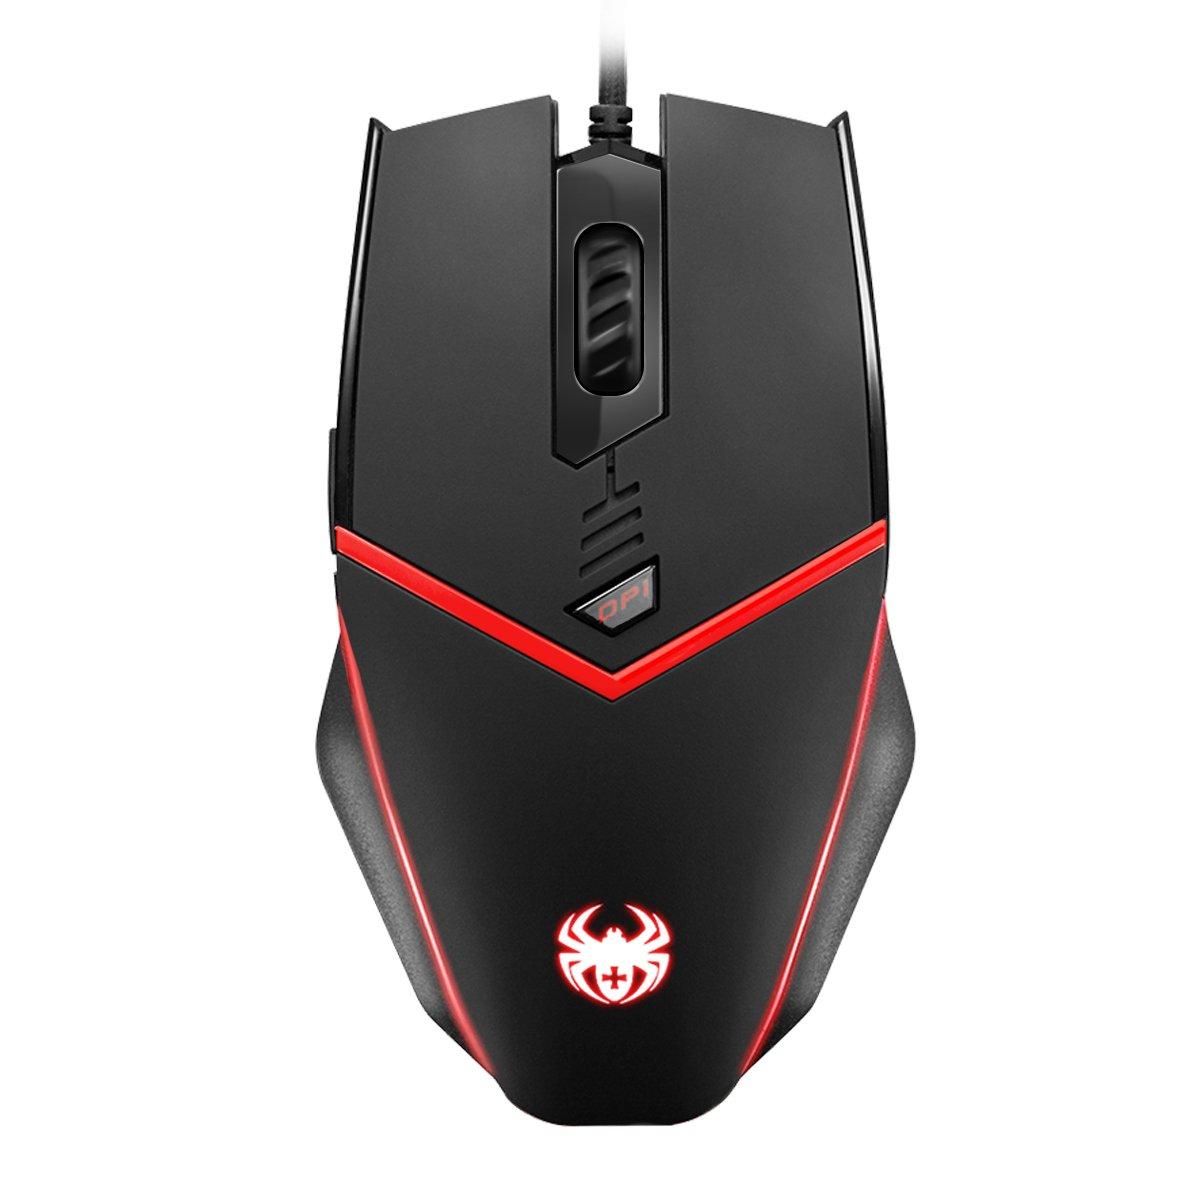 Mouse Gamer : Criacr Ergonomico USB Con cable Optico Ajustab